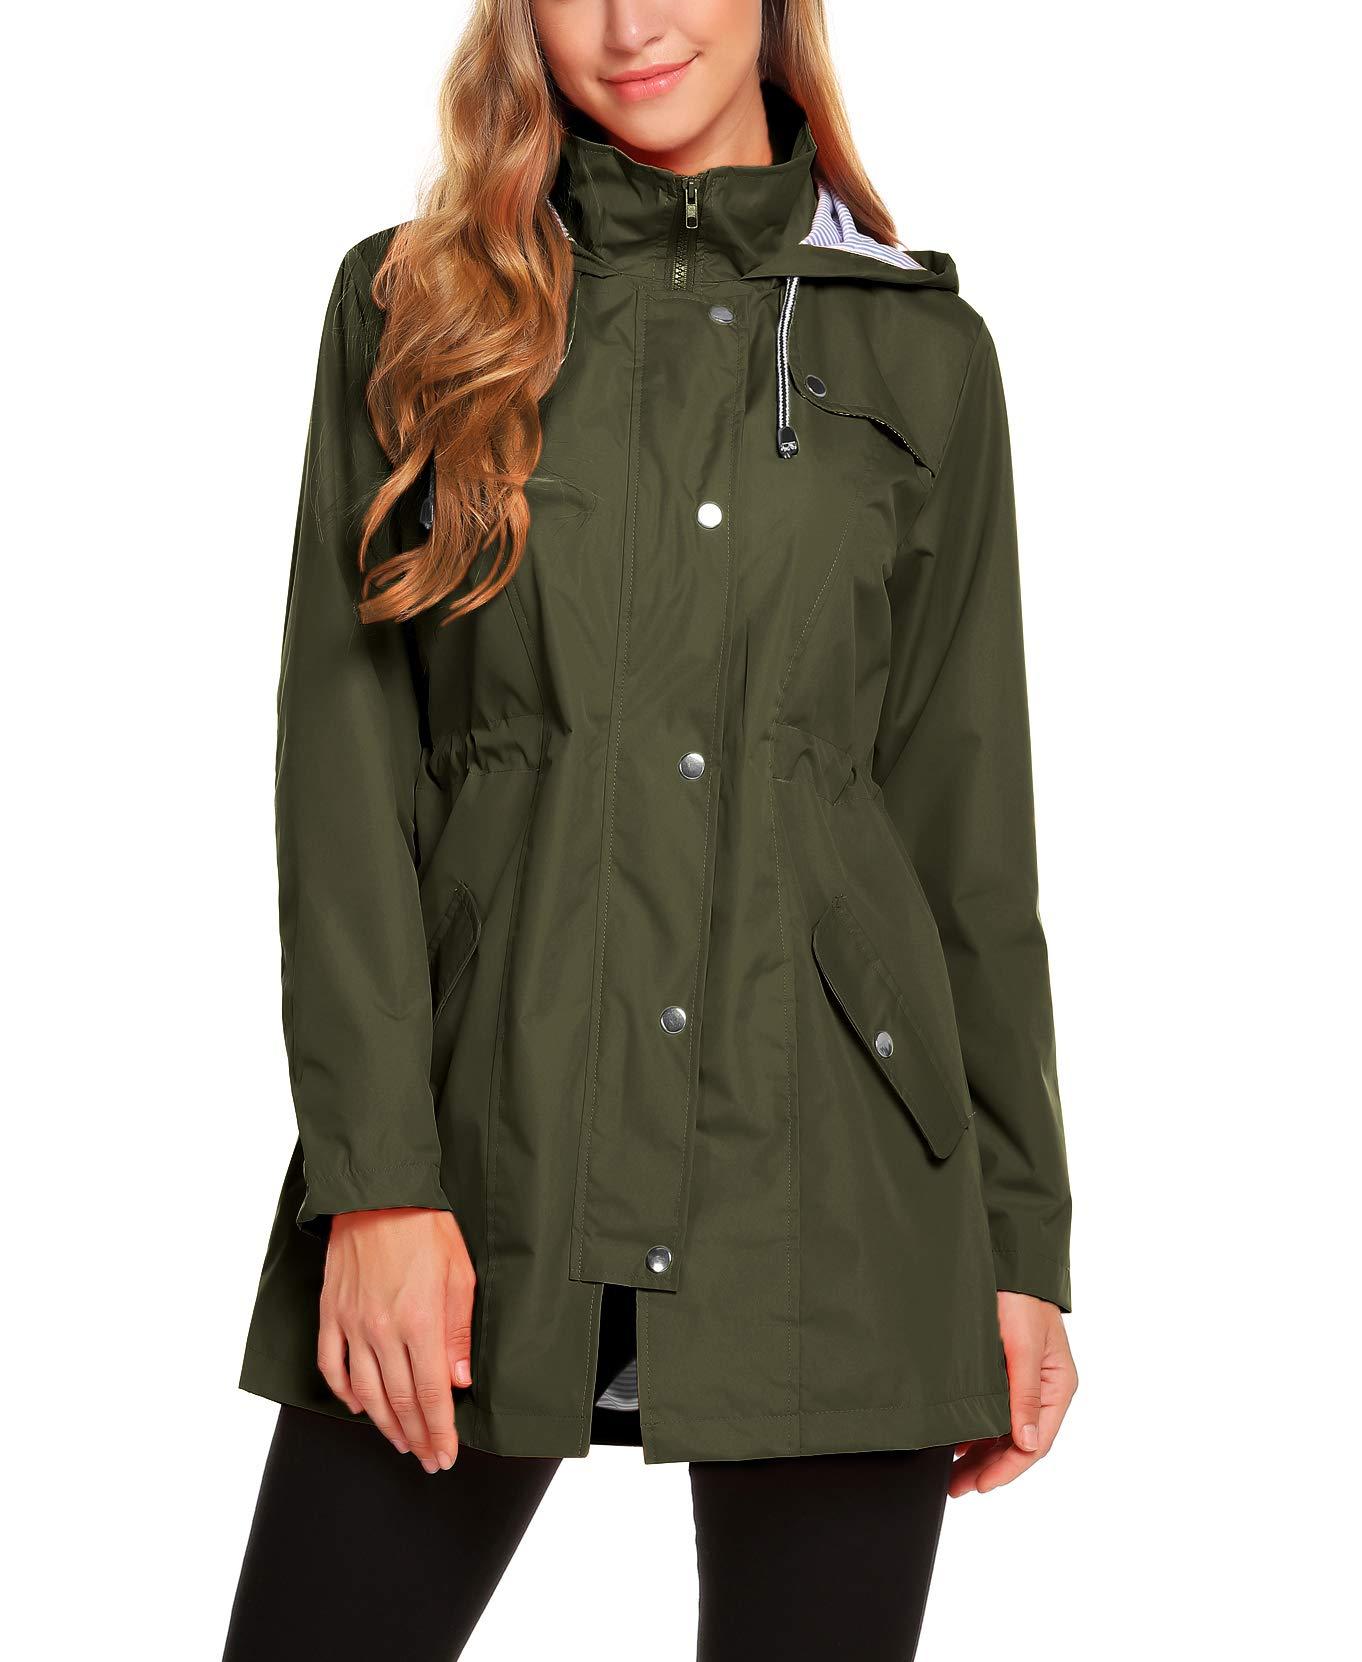 ZHENWEI Womens Lightweight Hooded Waterproof Active Outdoor Rain Jacket Army Green M by ZHENWEI